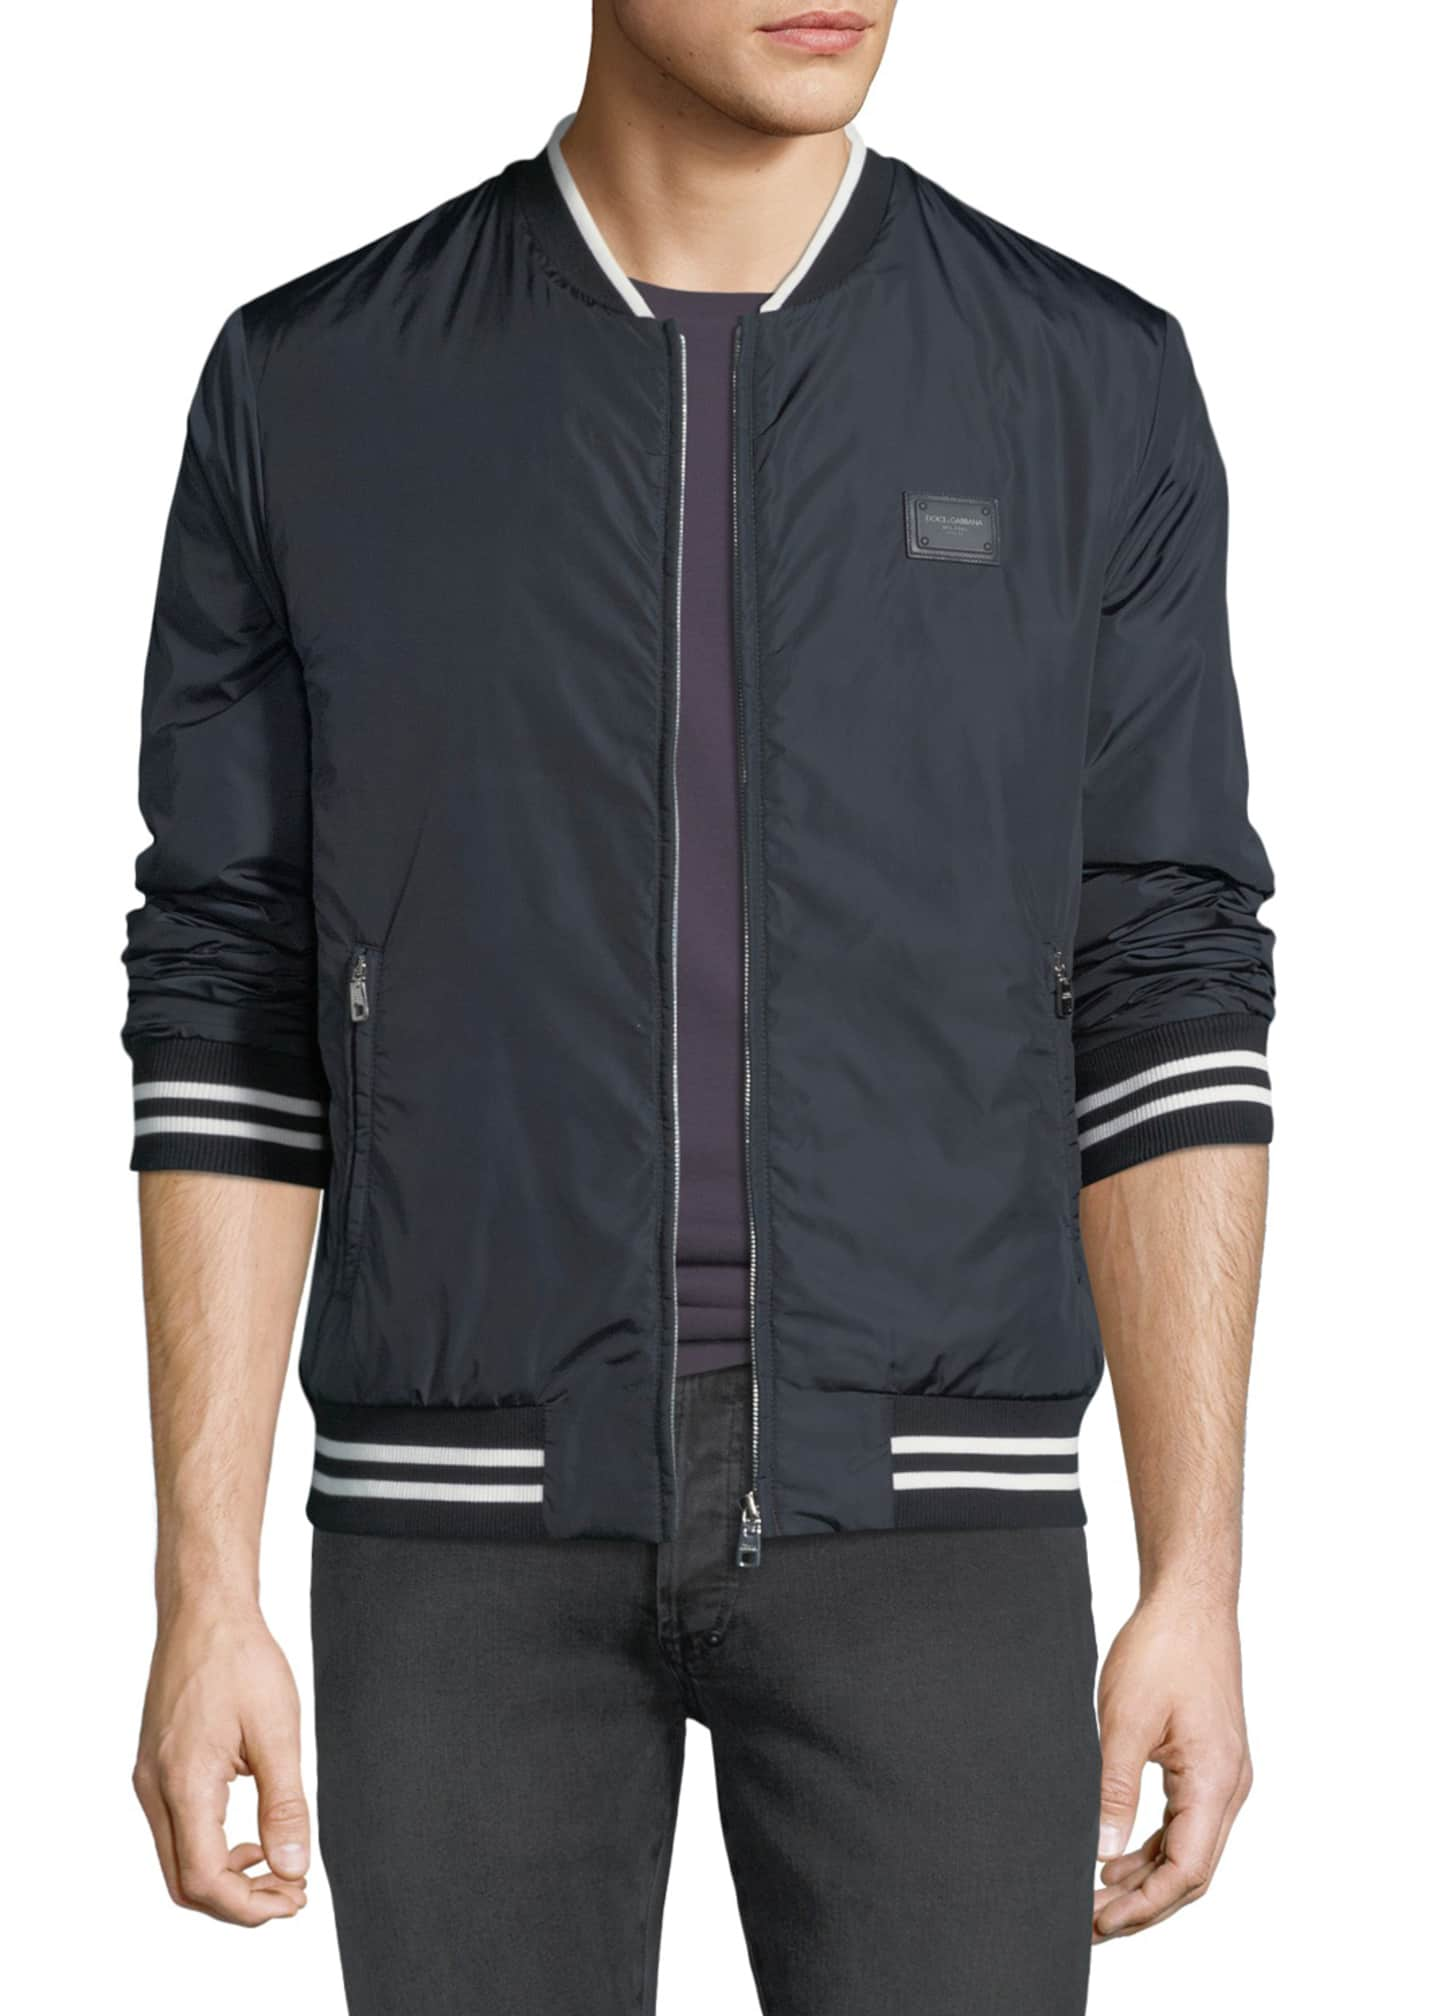 Dolce & Gabbana Men's Nylon Track Jacket